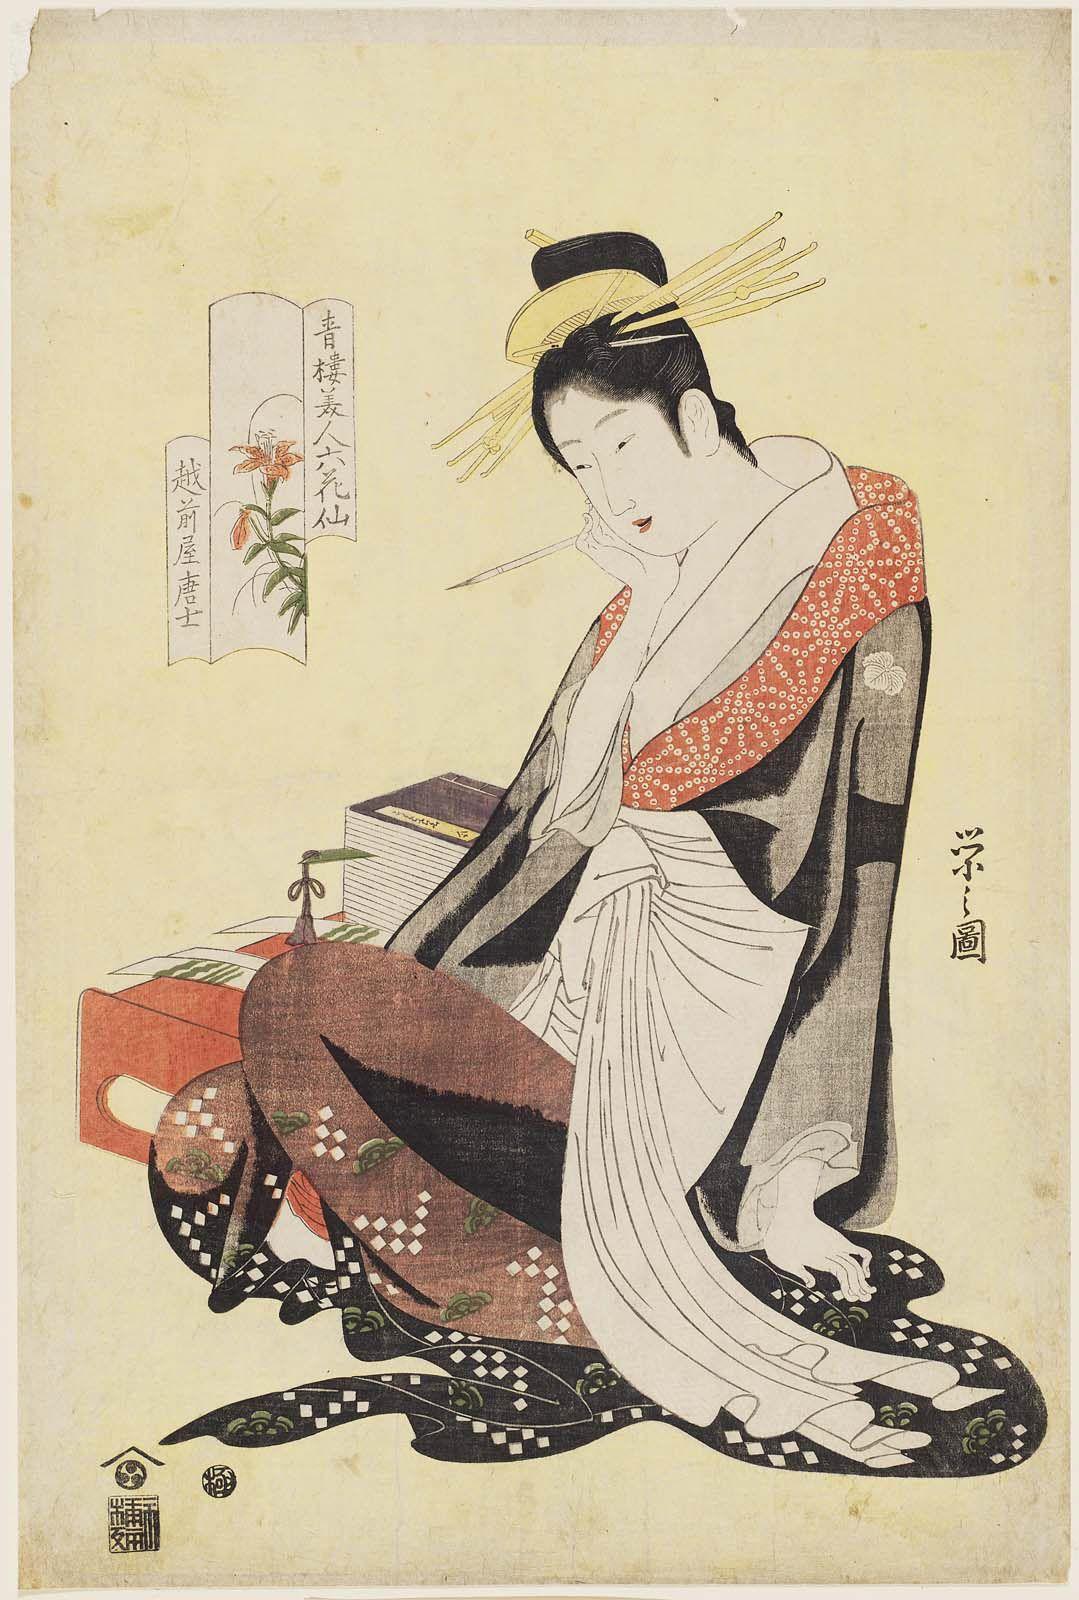 青楼美人六歌仙 越前屋唐土 Morokoshi Of The Echizenya From The